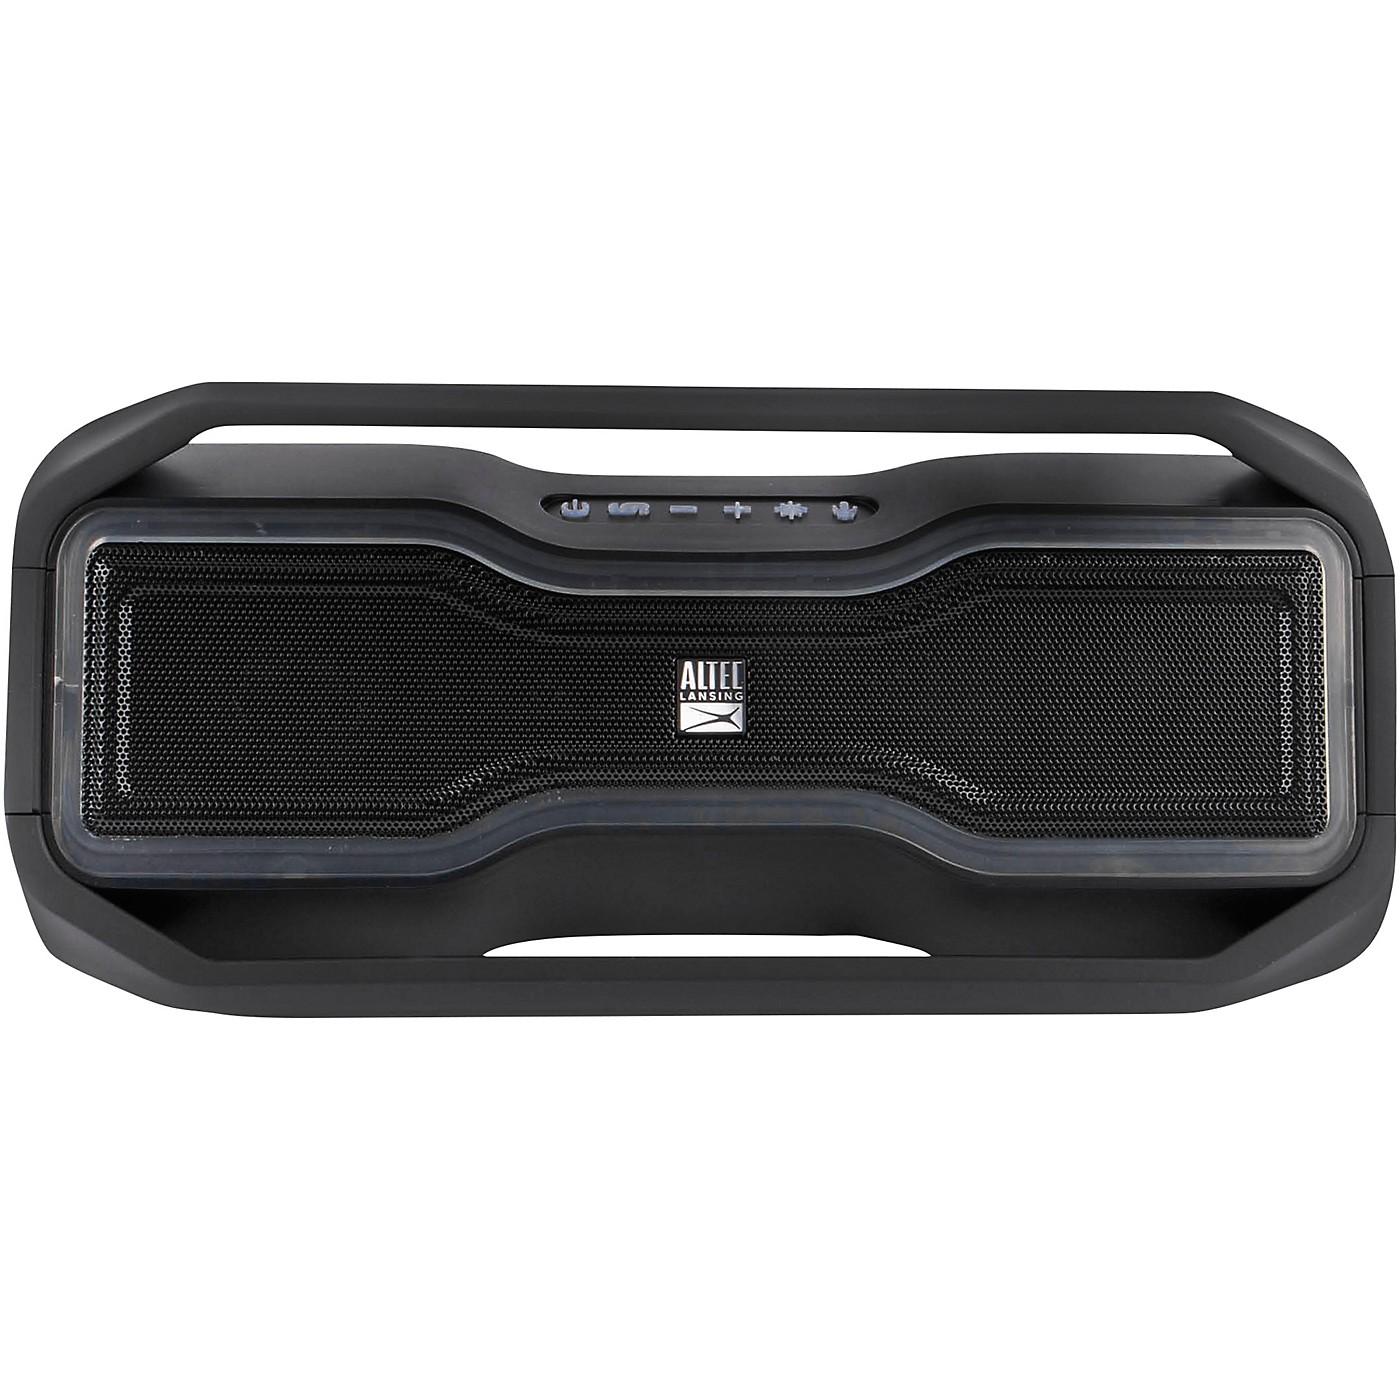 Altec Lansing Rock Box Mini Rugged Bluetooth Speaker thumbnail